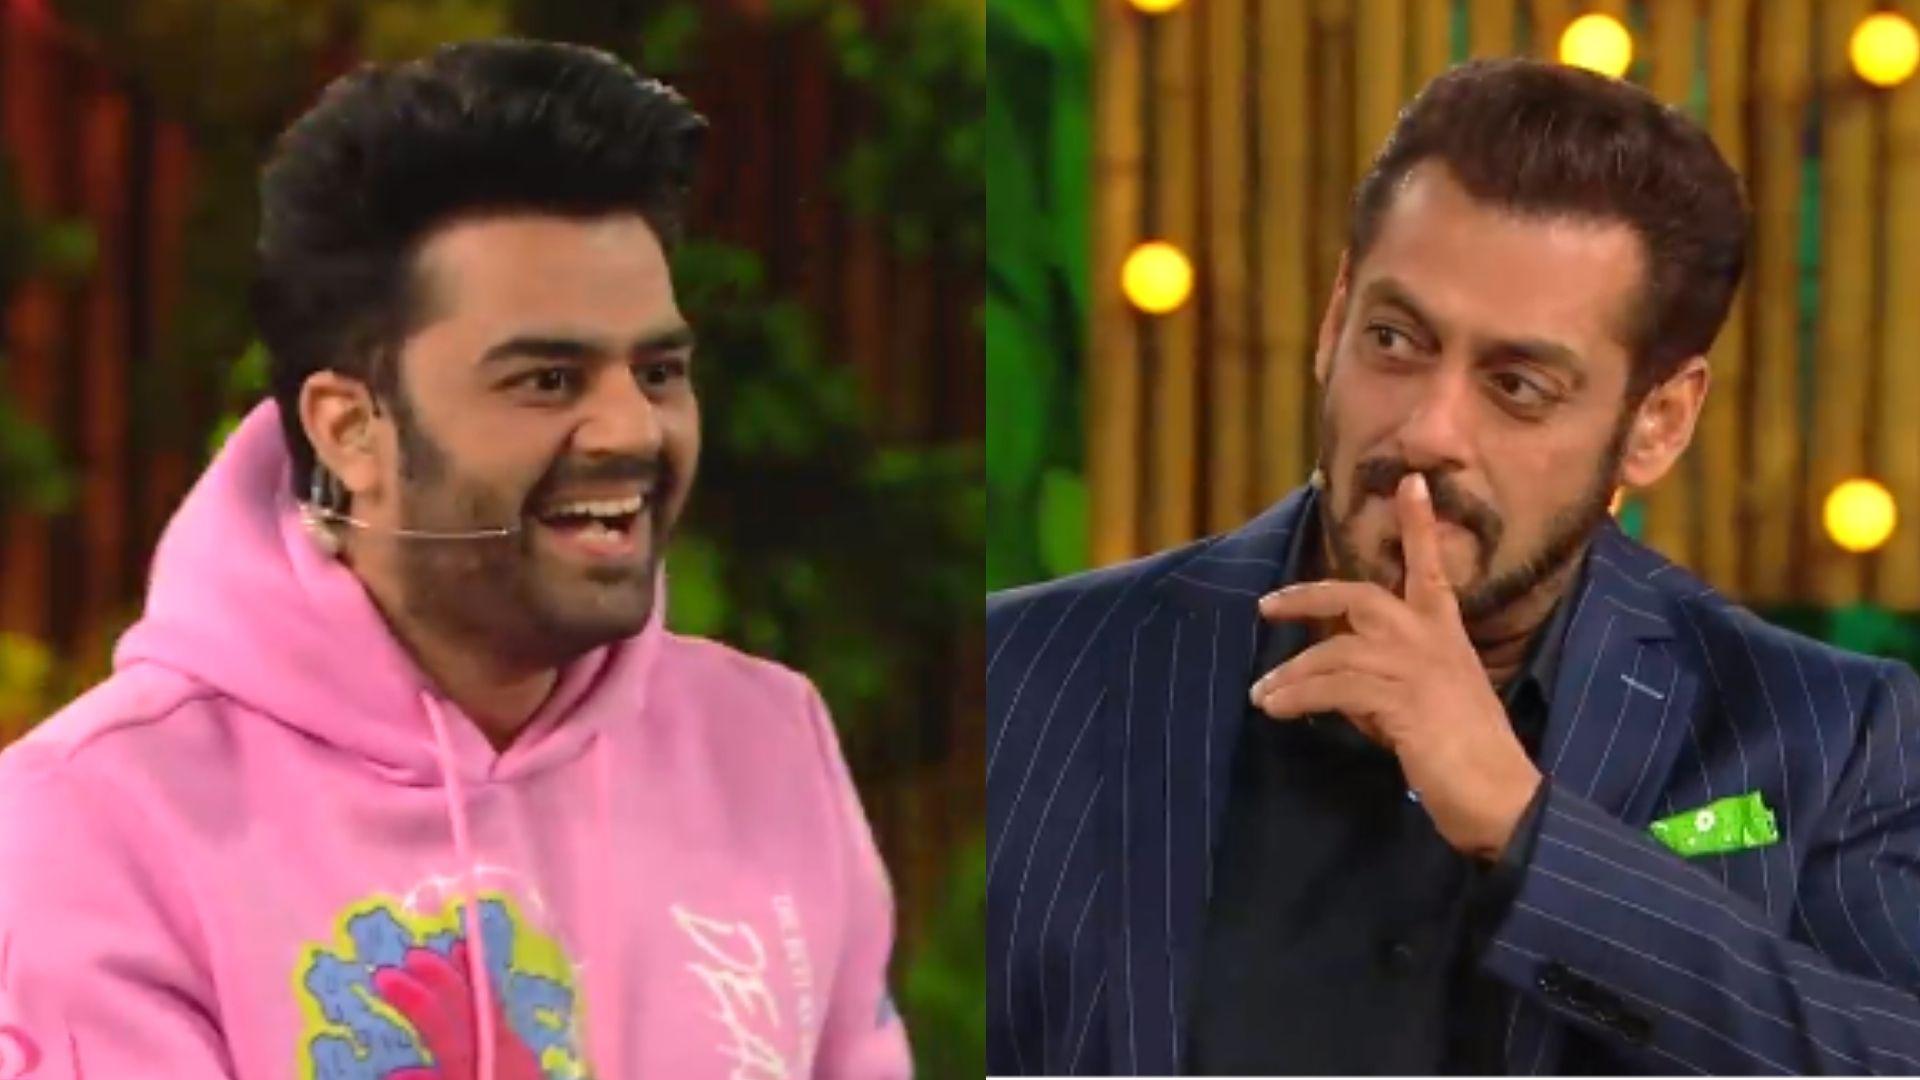 Bigg Boss 15: Maniesh Paul Asks Salman Khan About Hosting Bigg Boss 16; Host Places A Finger On His Lips